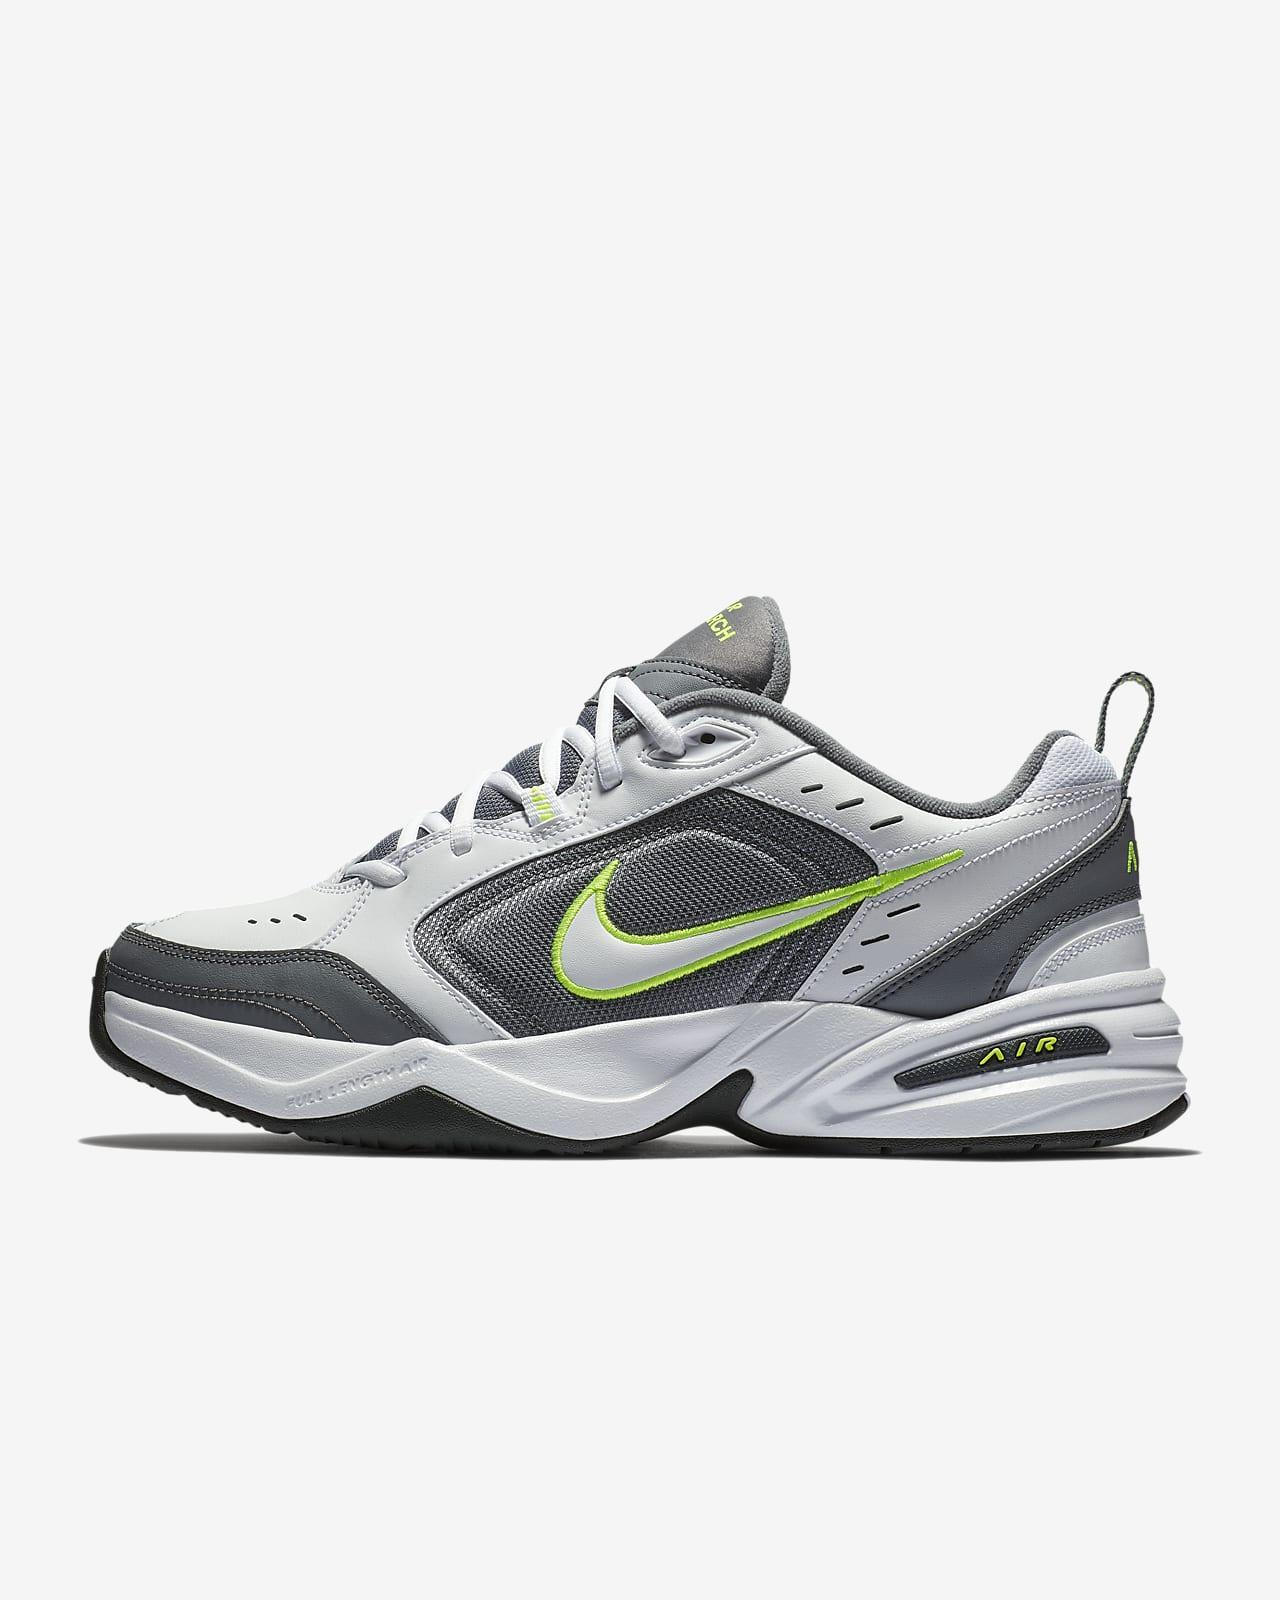 Nike Air Monarch IV Men's Training Shoes